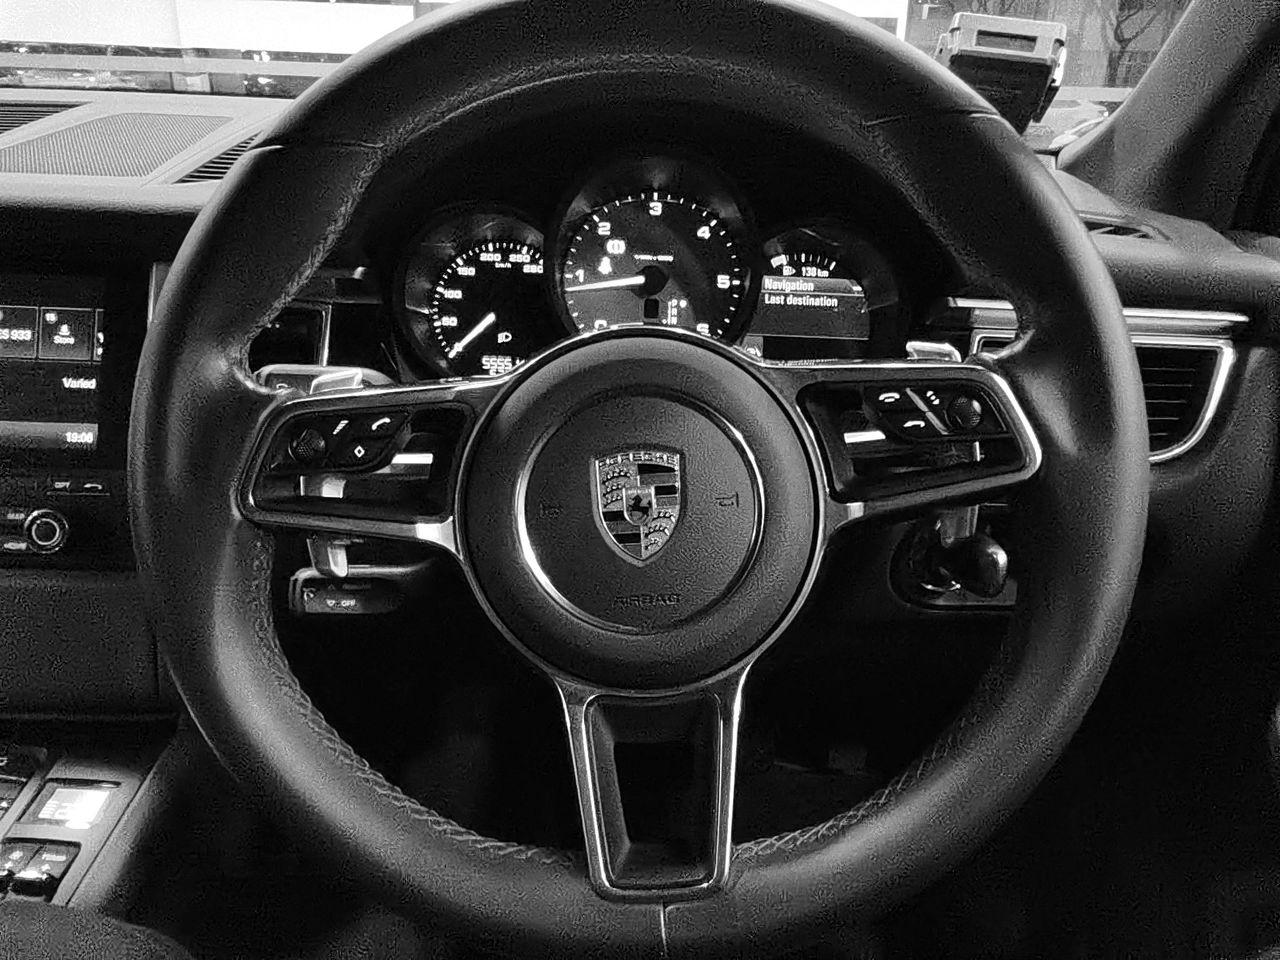 Porsche MACAN S DIESEL 3.0